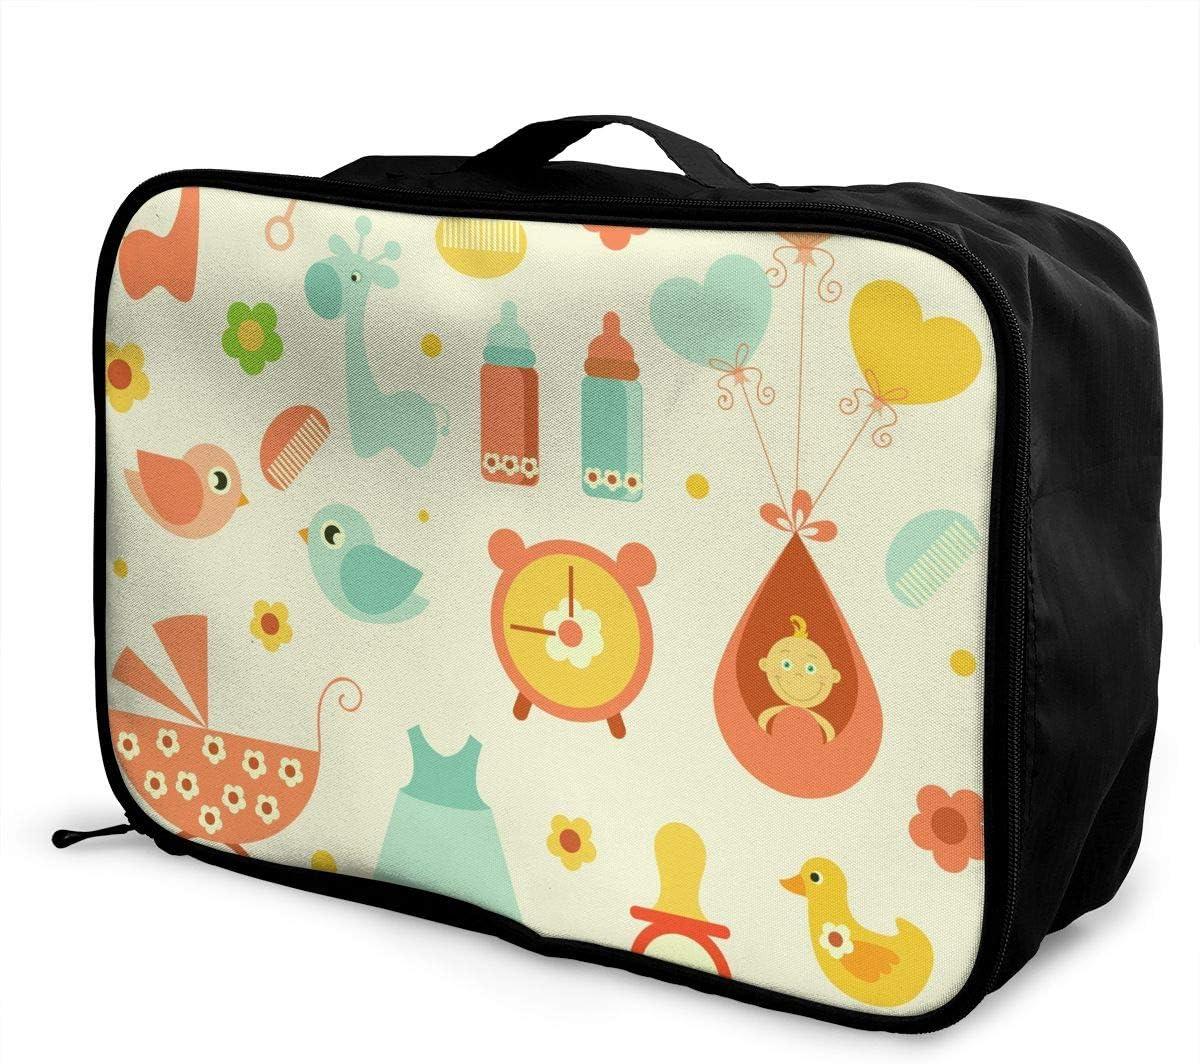 Baby Travel Carry-on Luggage Weekender Bag Overnight Tote Flight Duffel In Trolley Handle